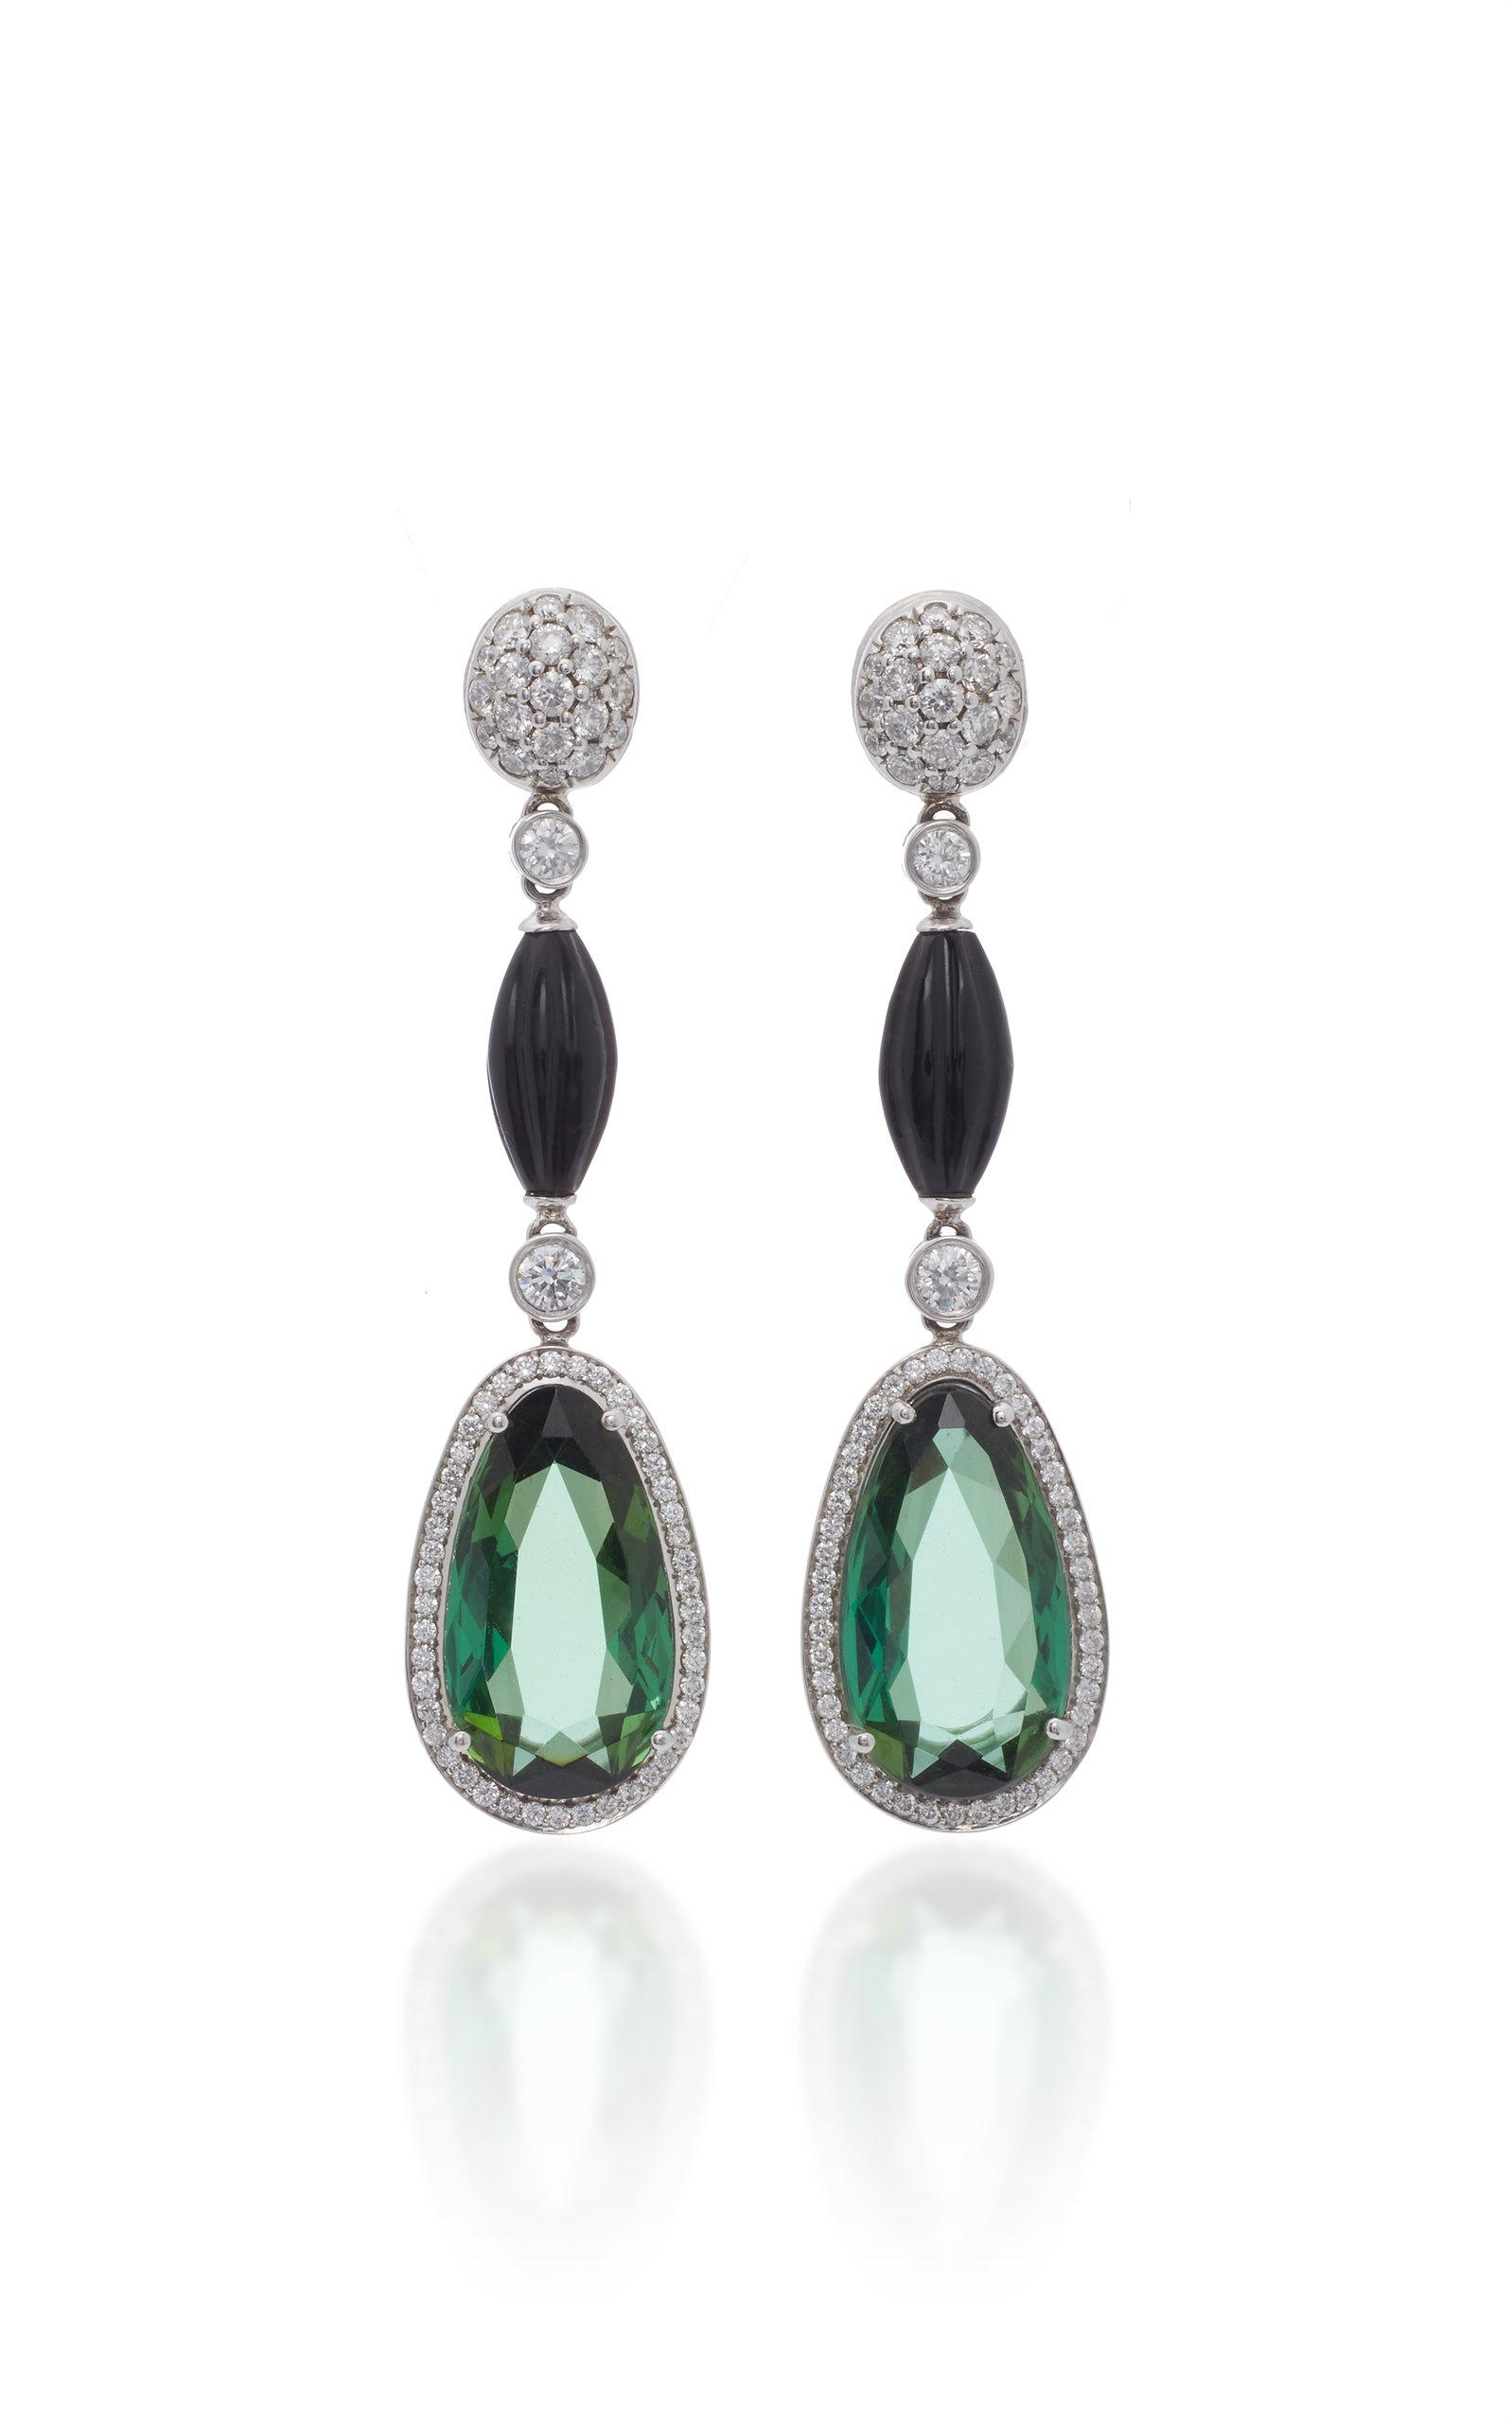 GOSHWARA 18K White Gold Tourmaline And Diamond Earrings in Green